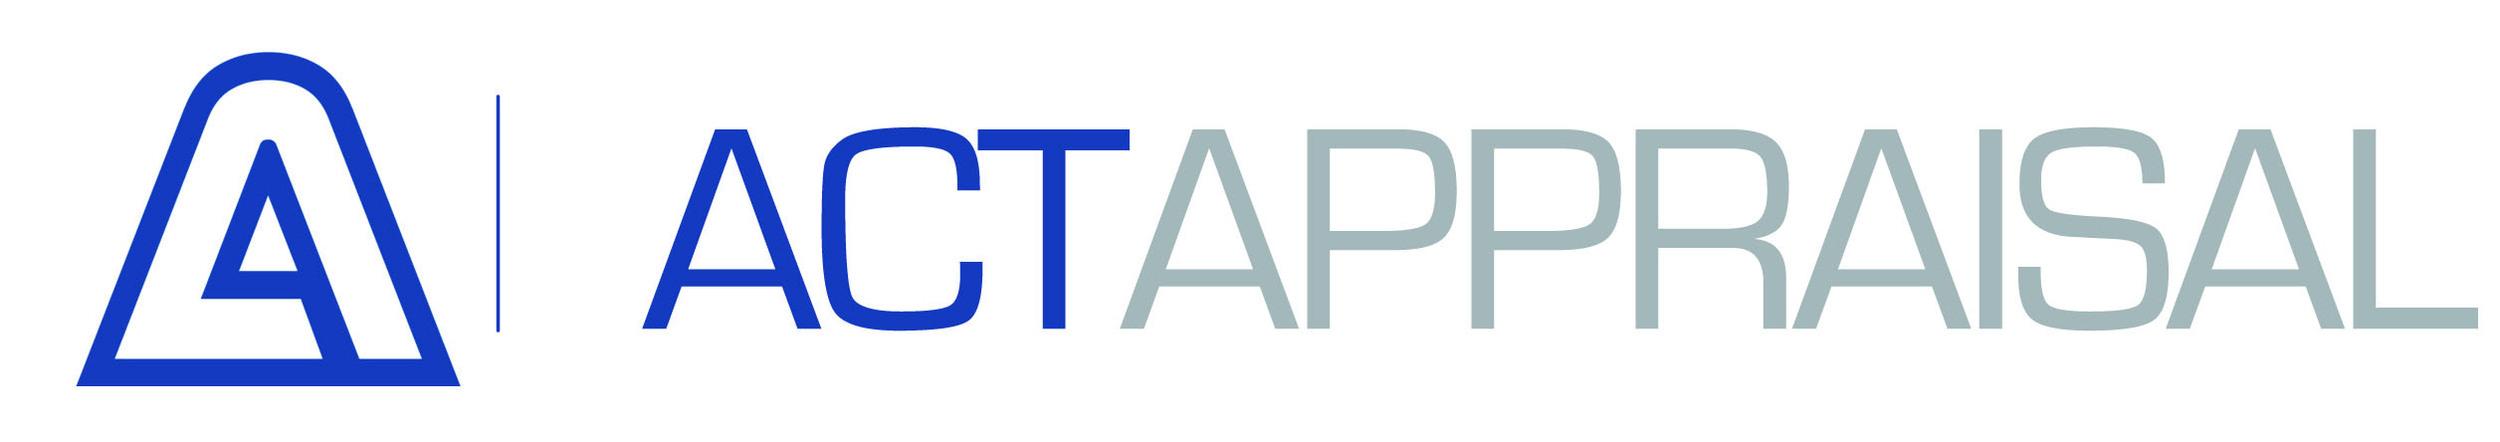 ACT-Appraisal.jpg